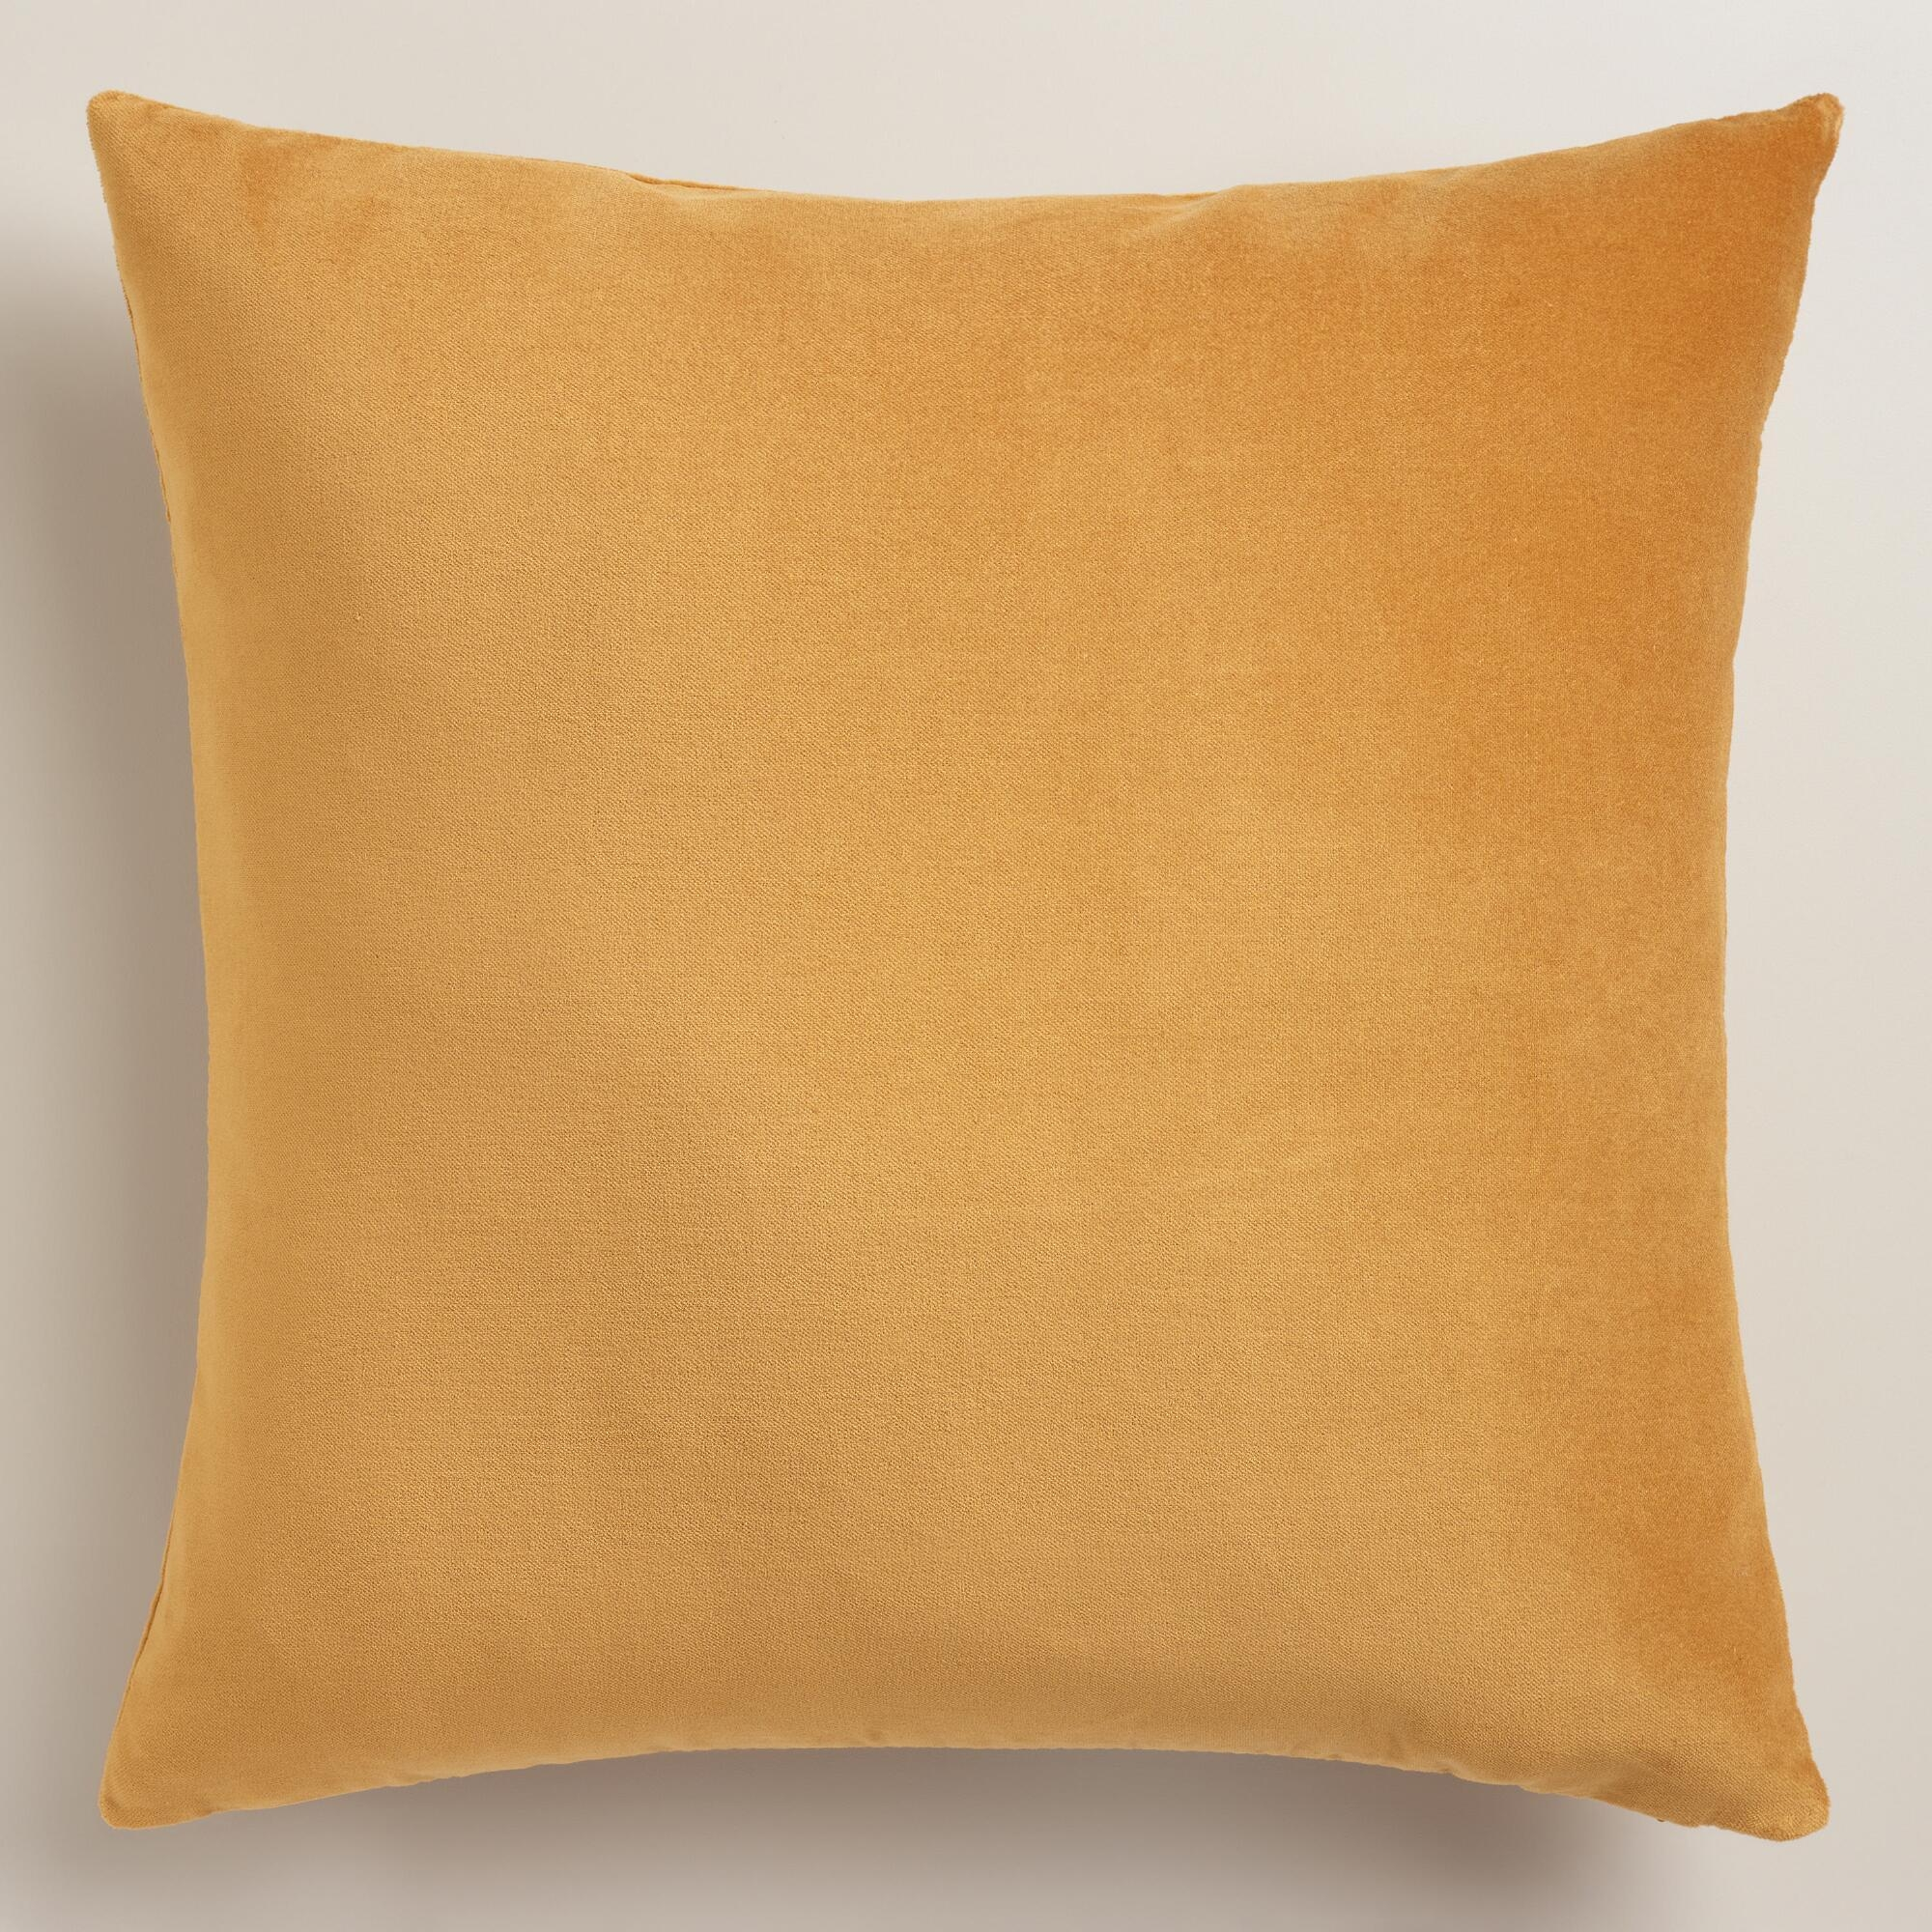 Decorative Gold Throw Pillows | Home Designjohn Regarding Gold Sofa Pillows (View 3 of 20)